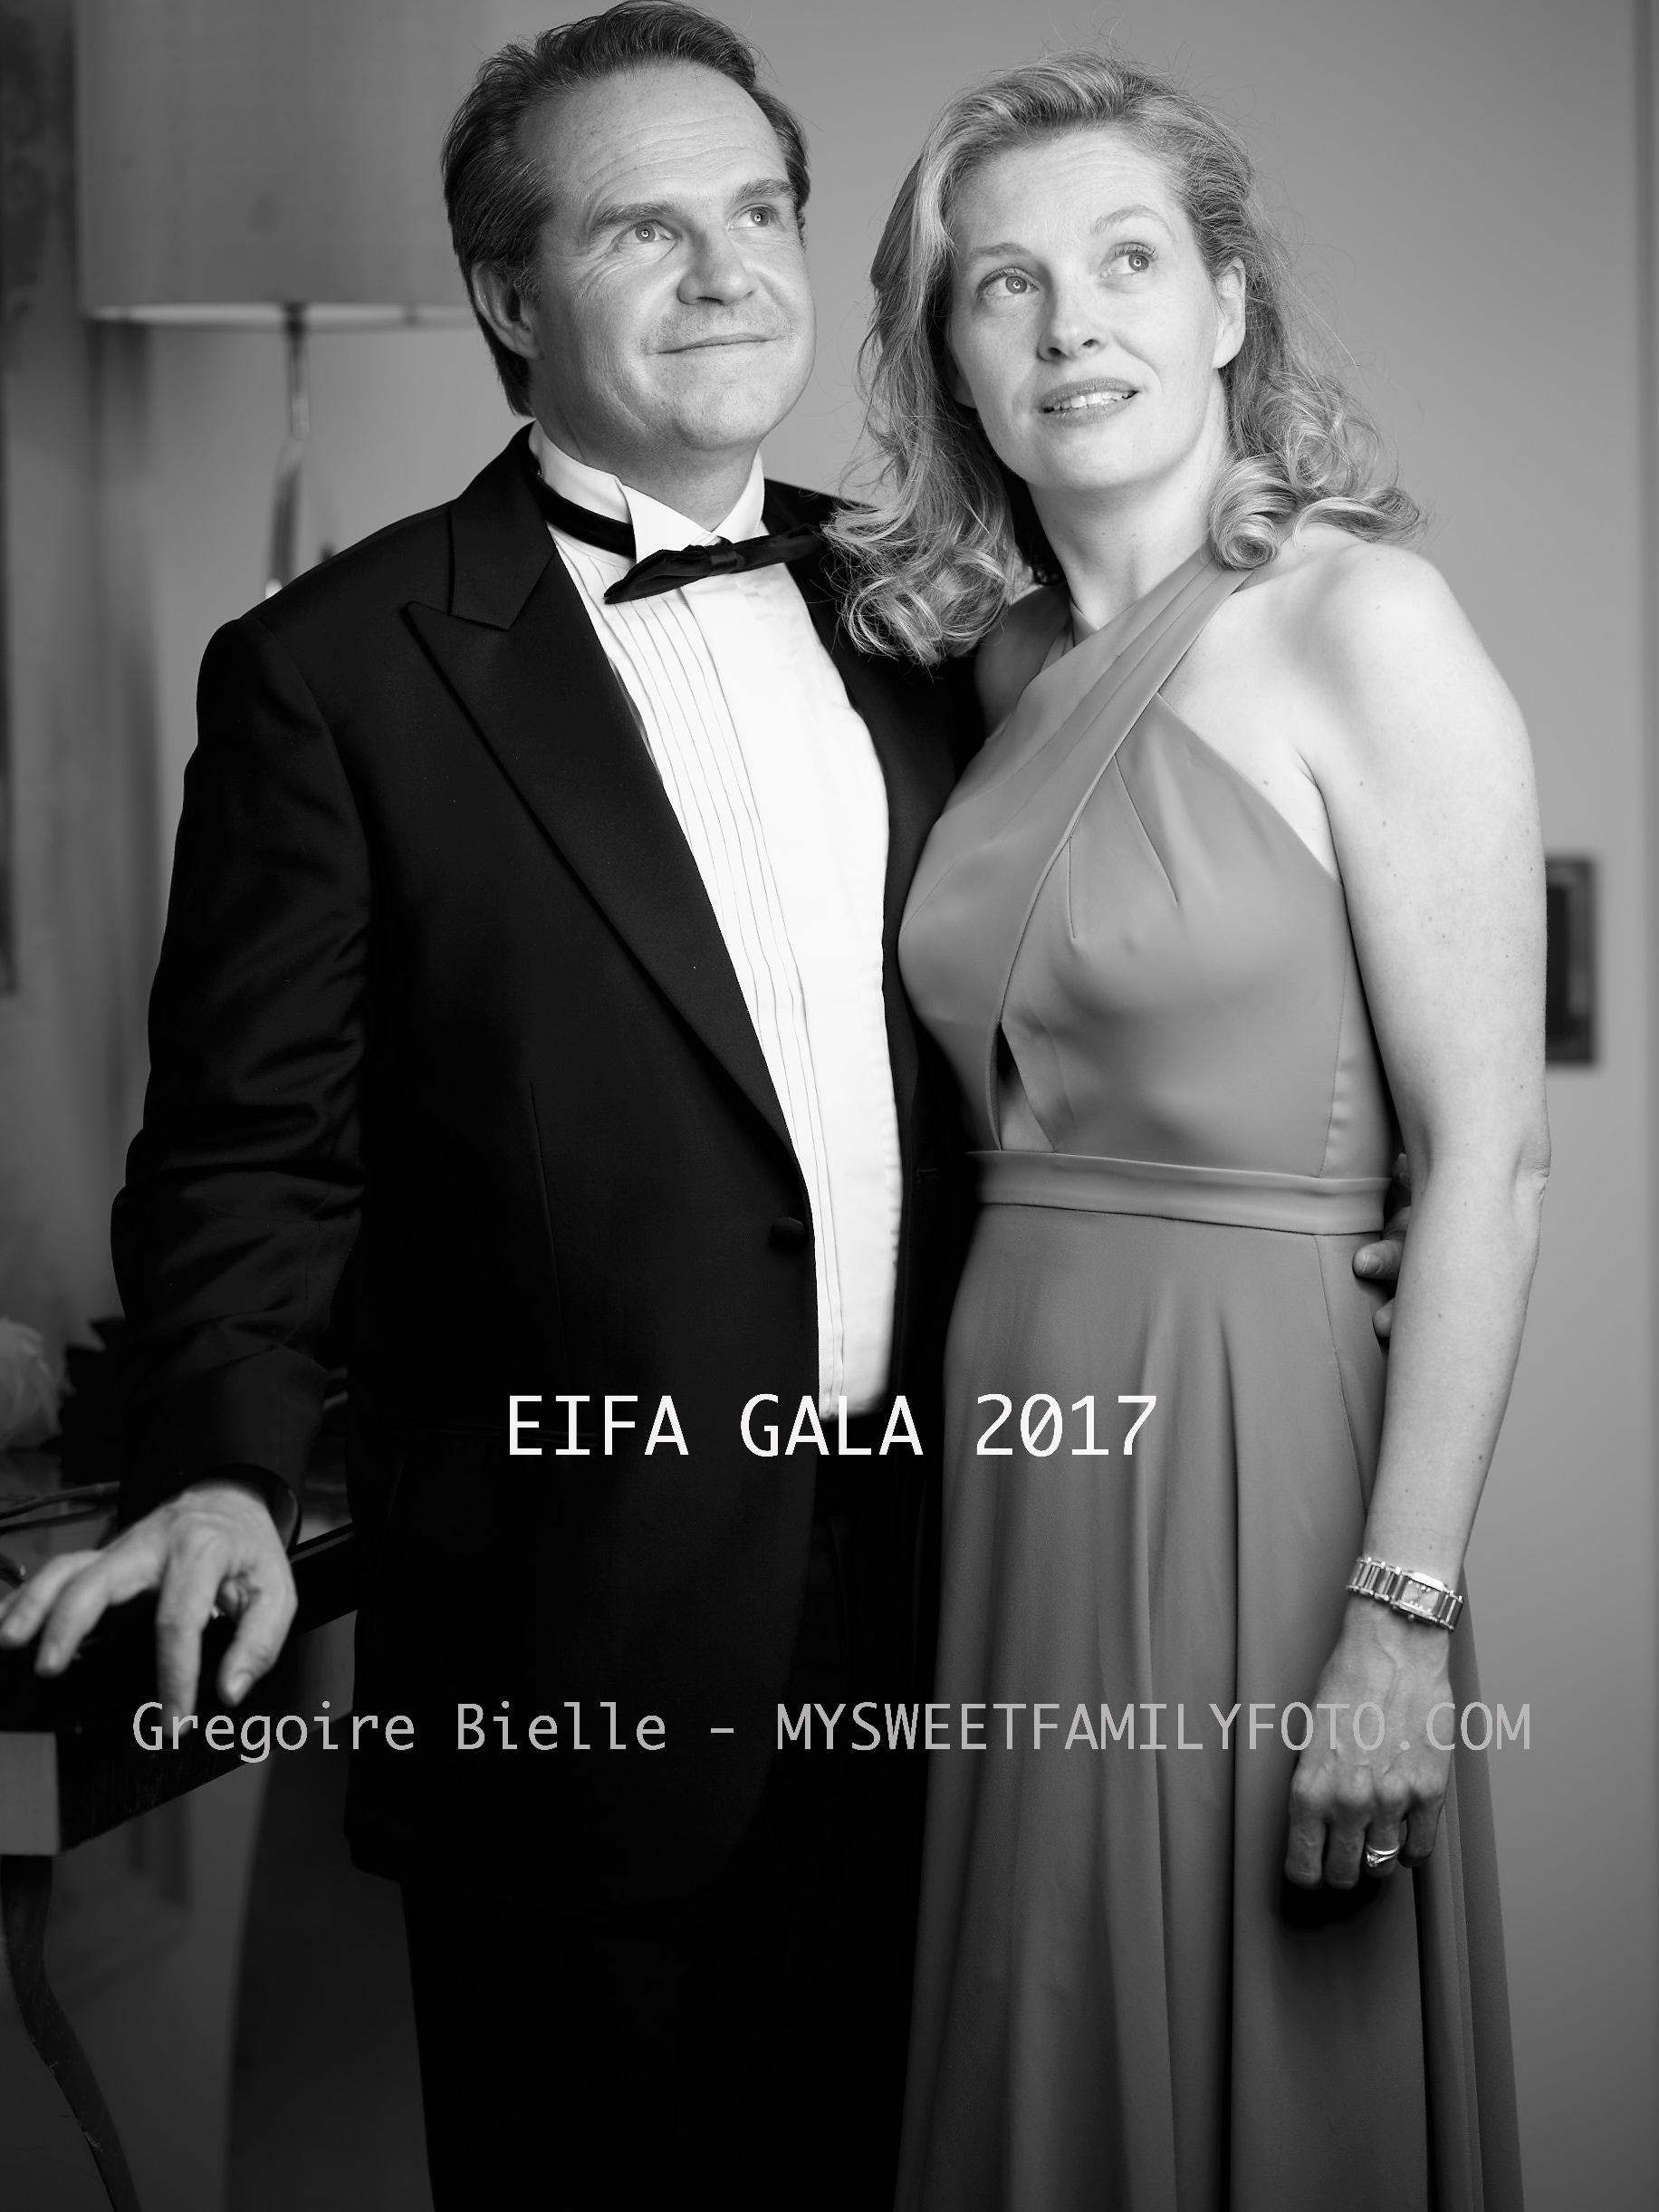 EIFA GALA 1280.jpg